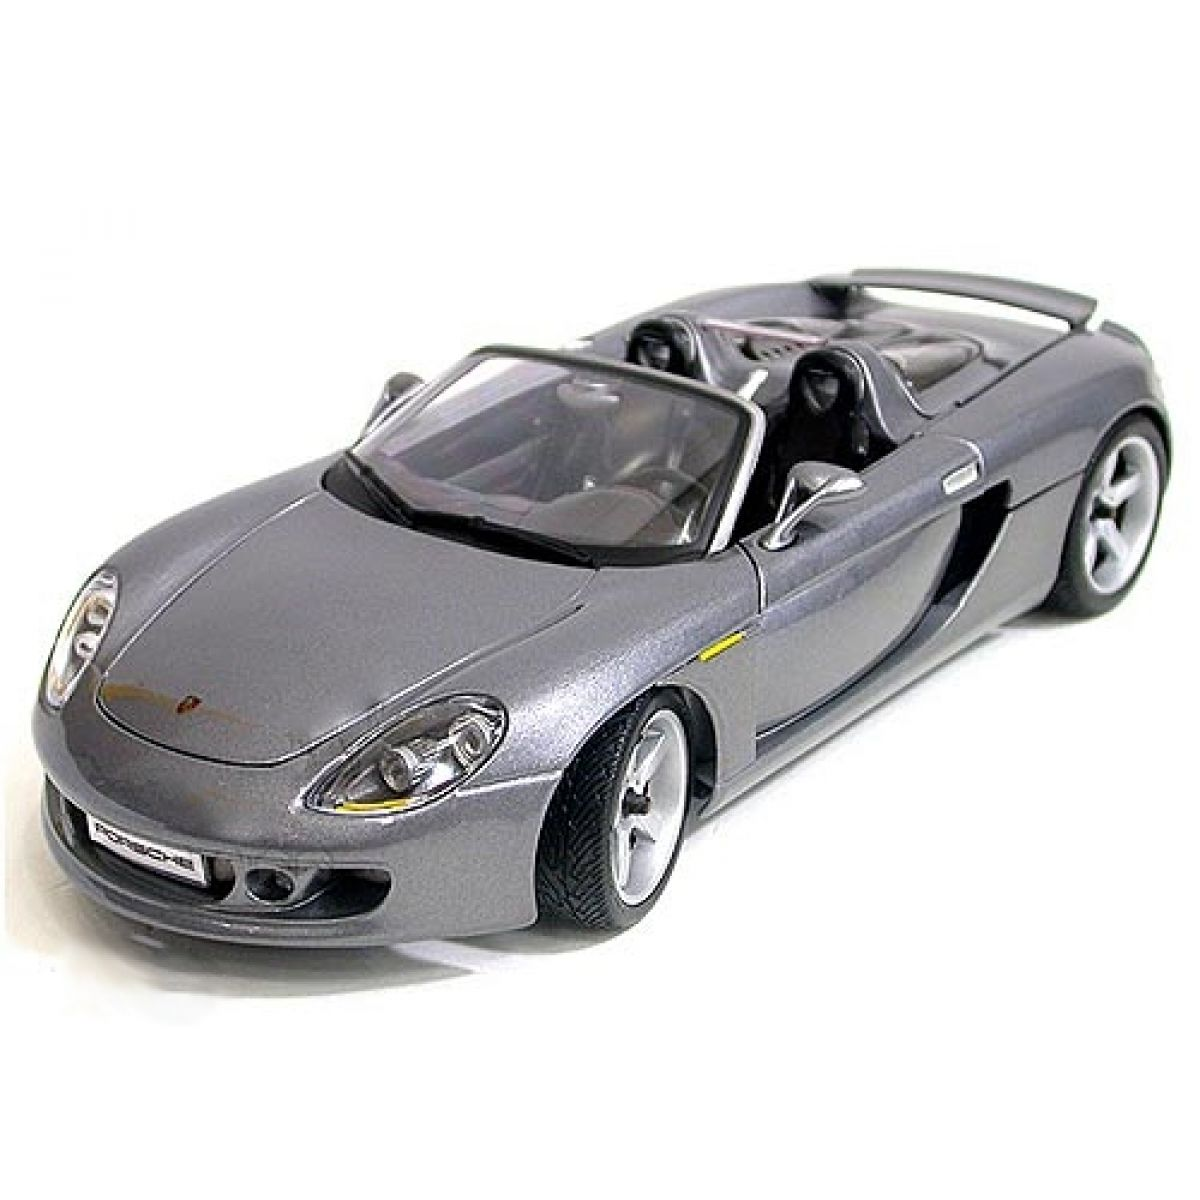 Porsche Carrera GT Maisto 1:18